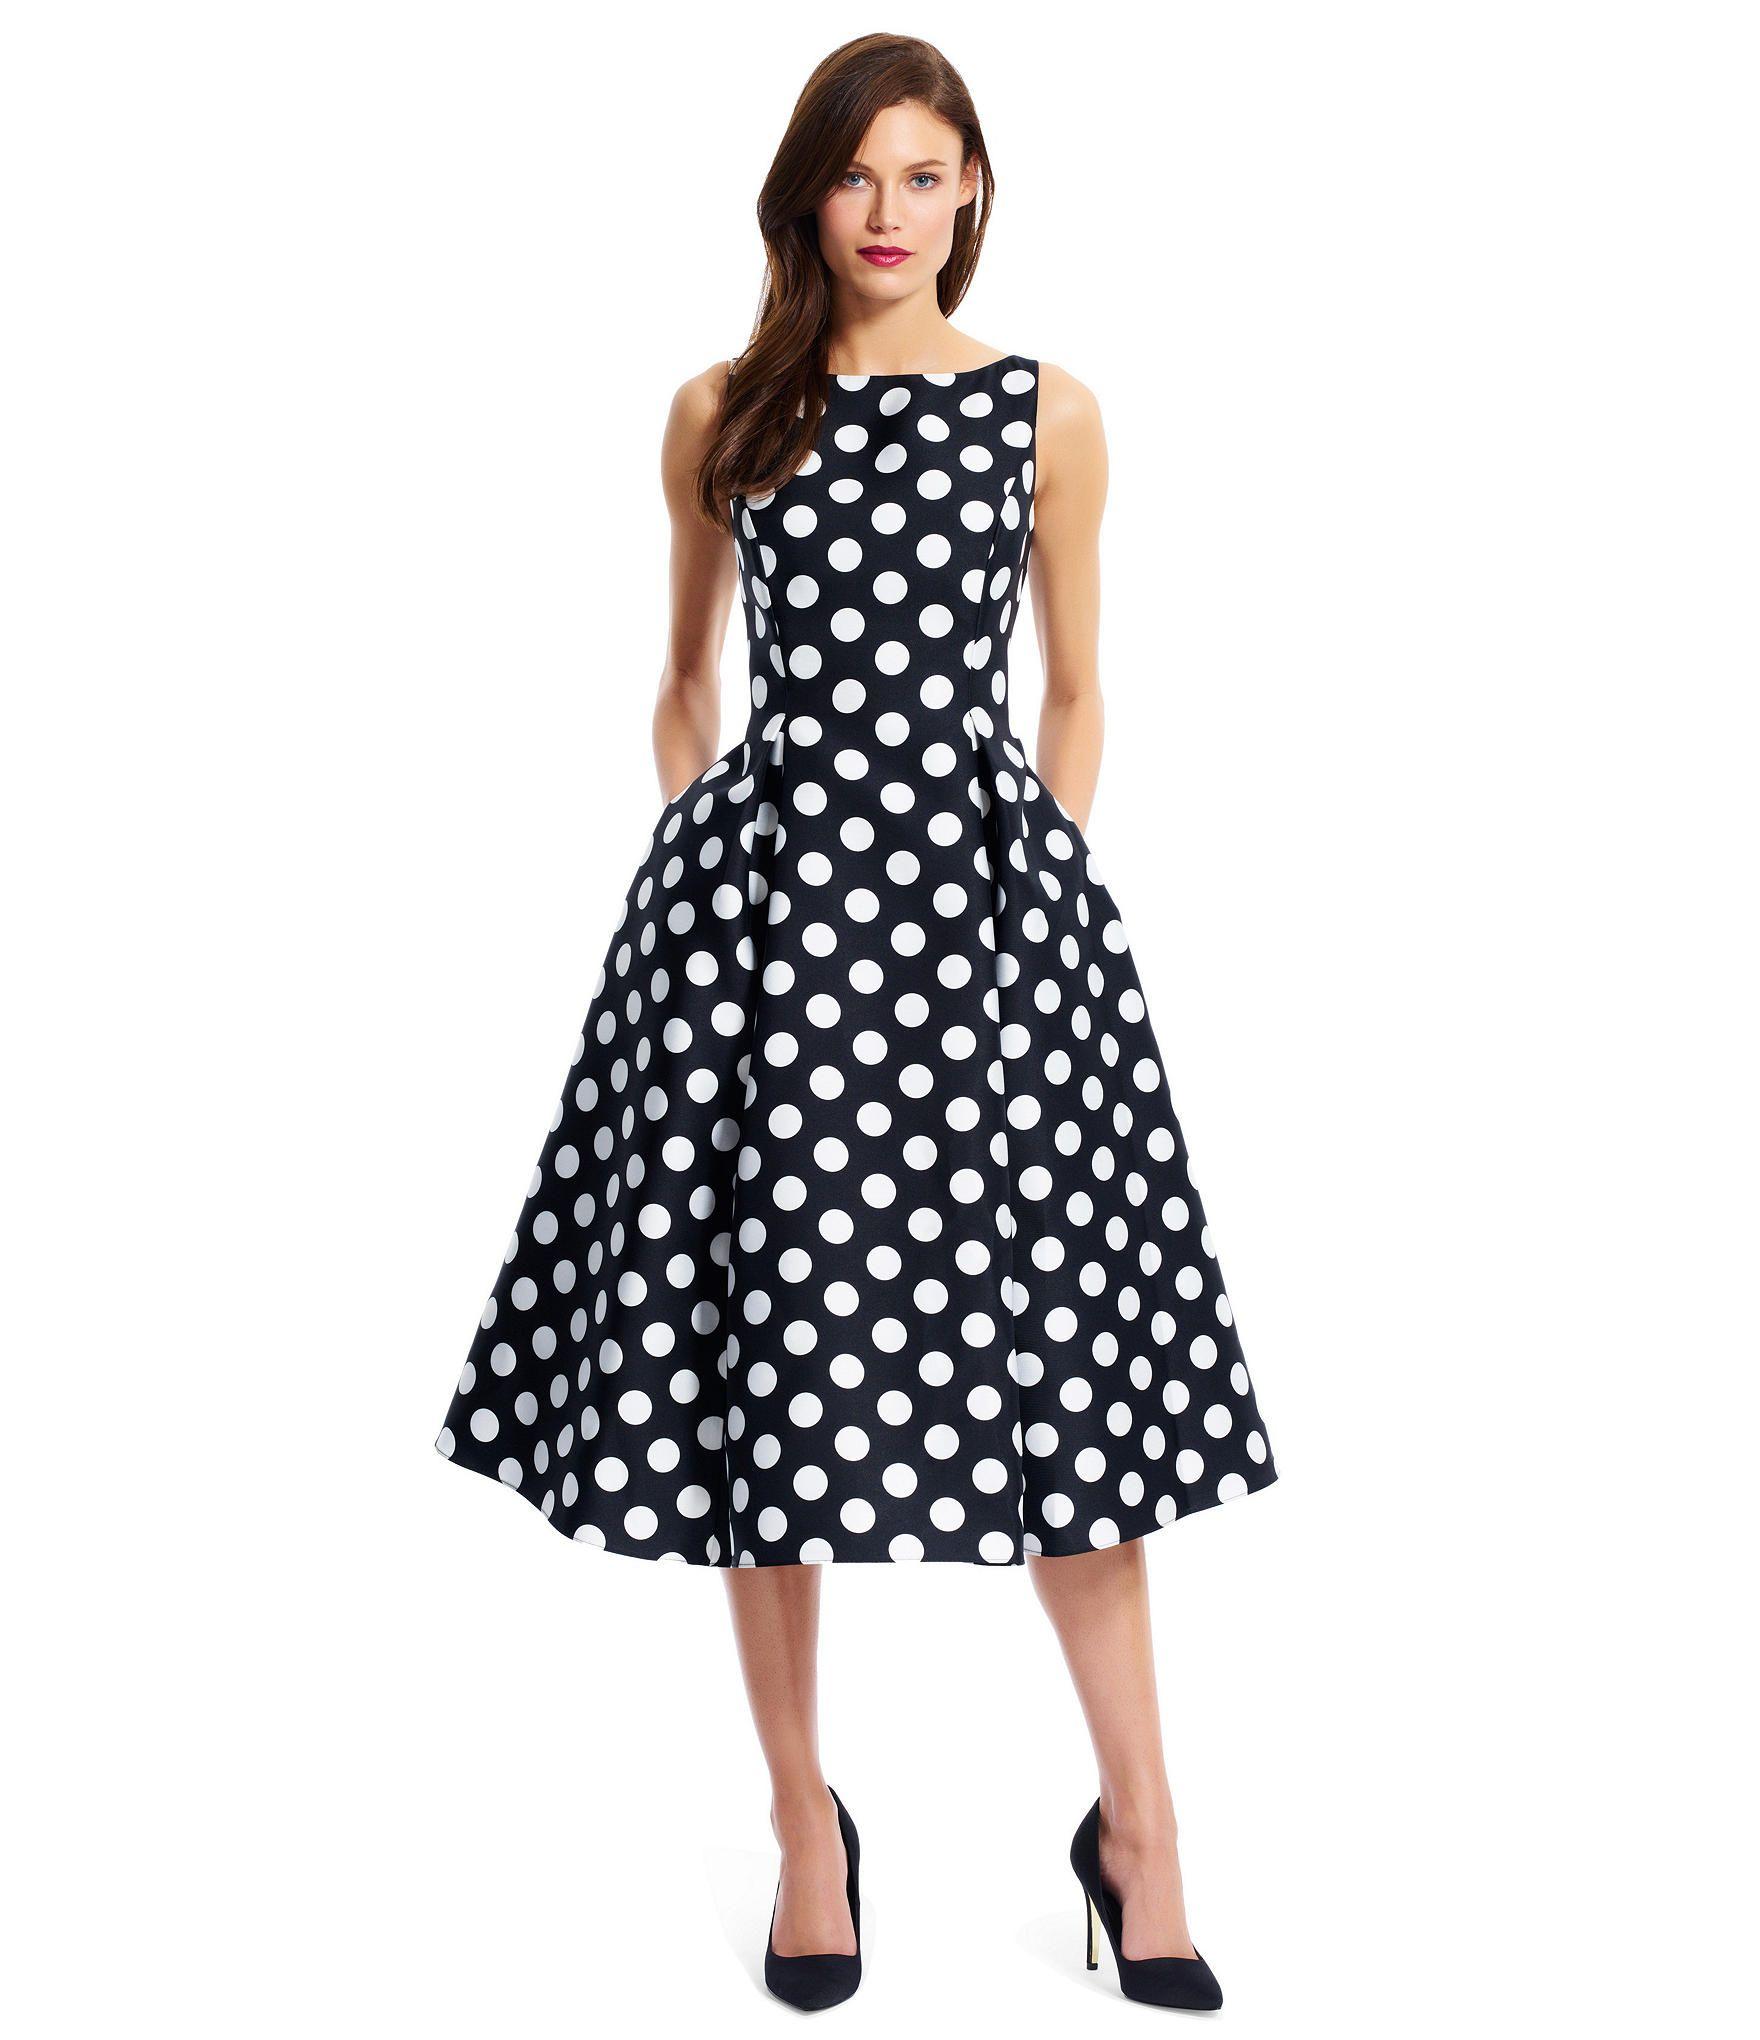 8881d10ff11 Adrianna Papell Polka Dot Tea Length Dress